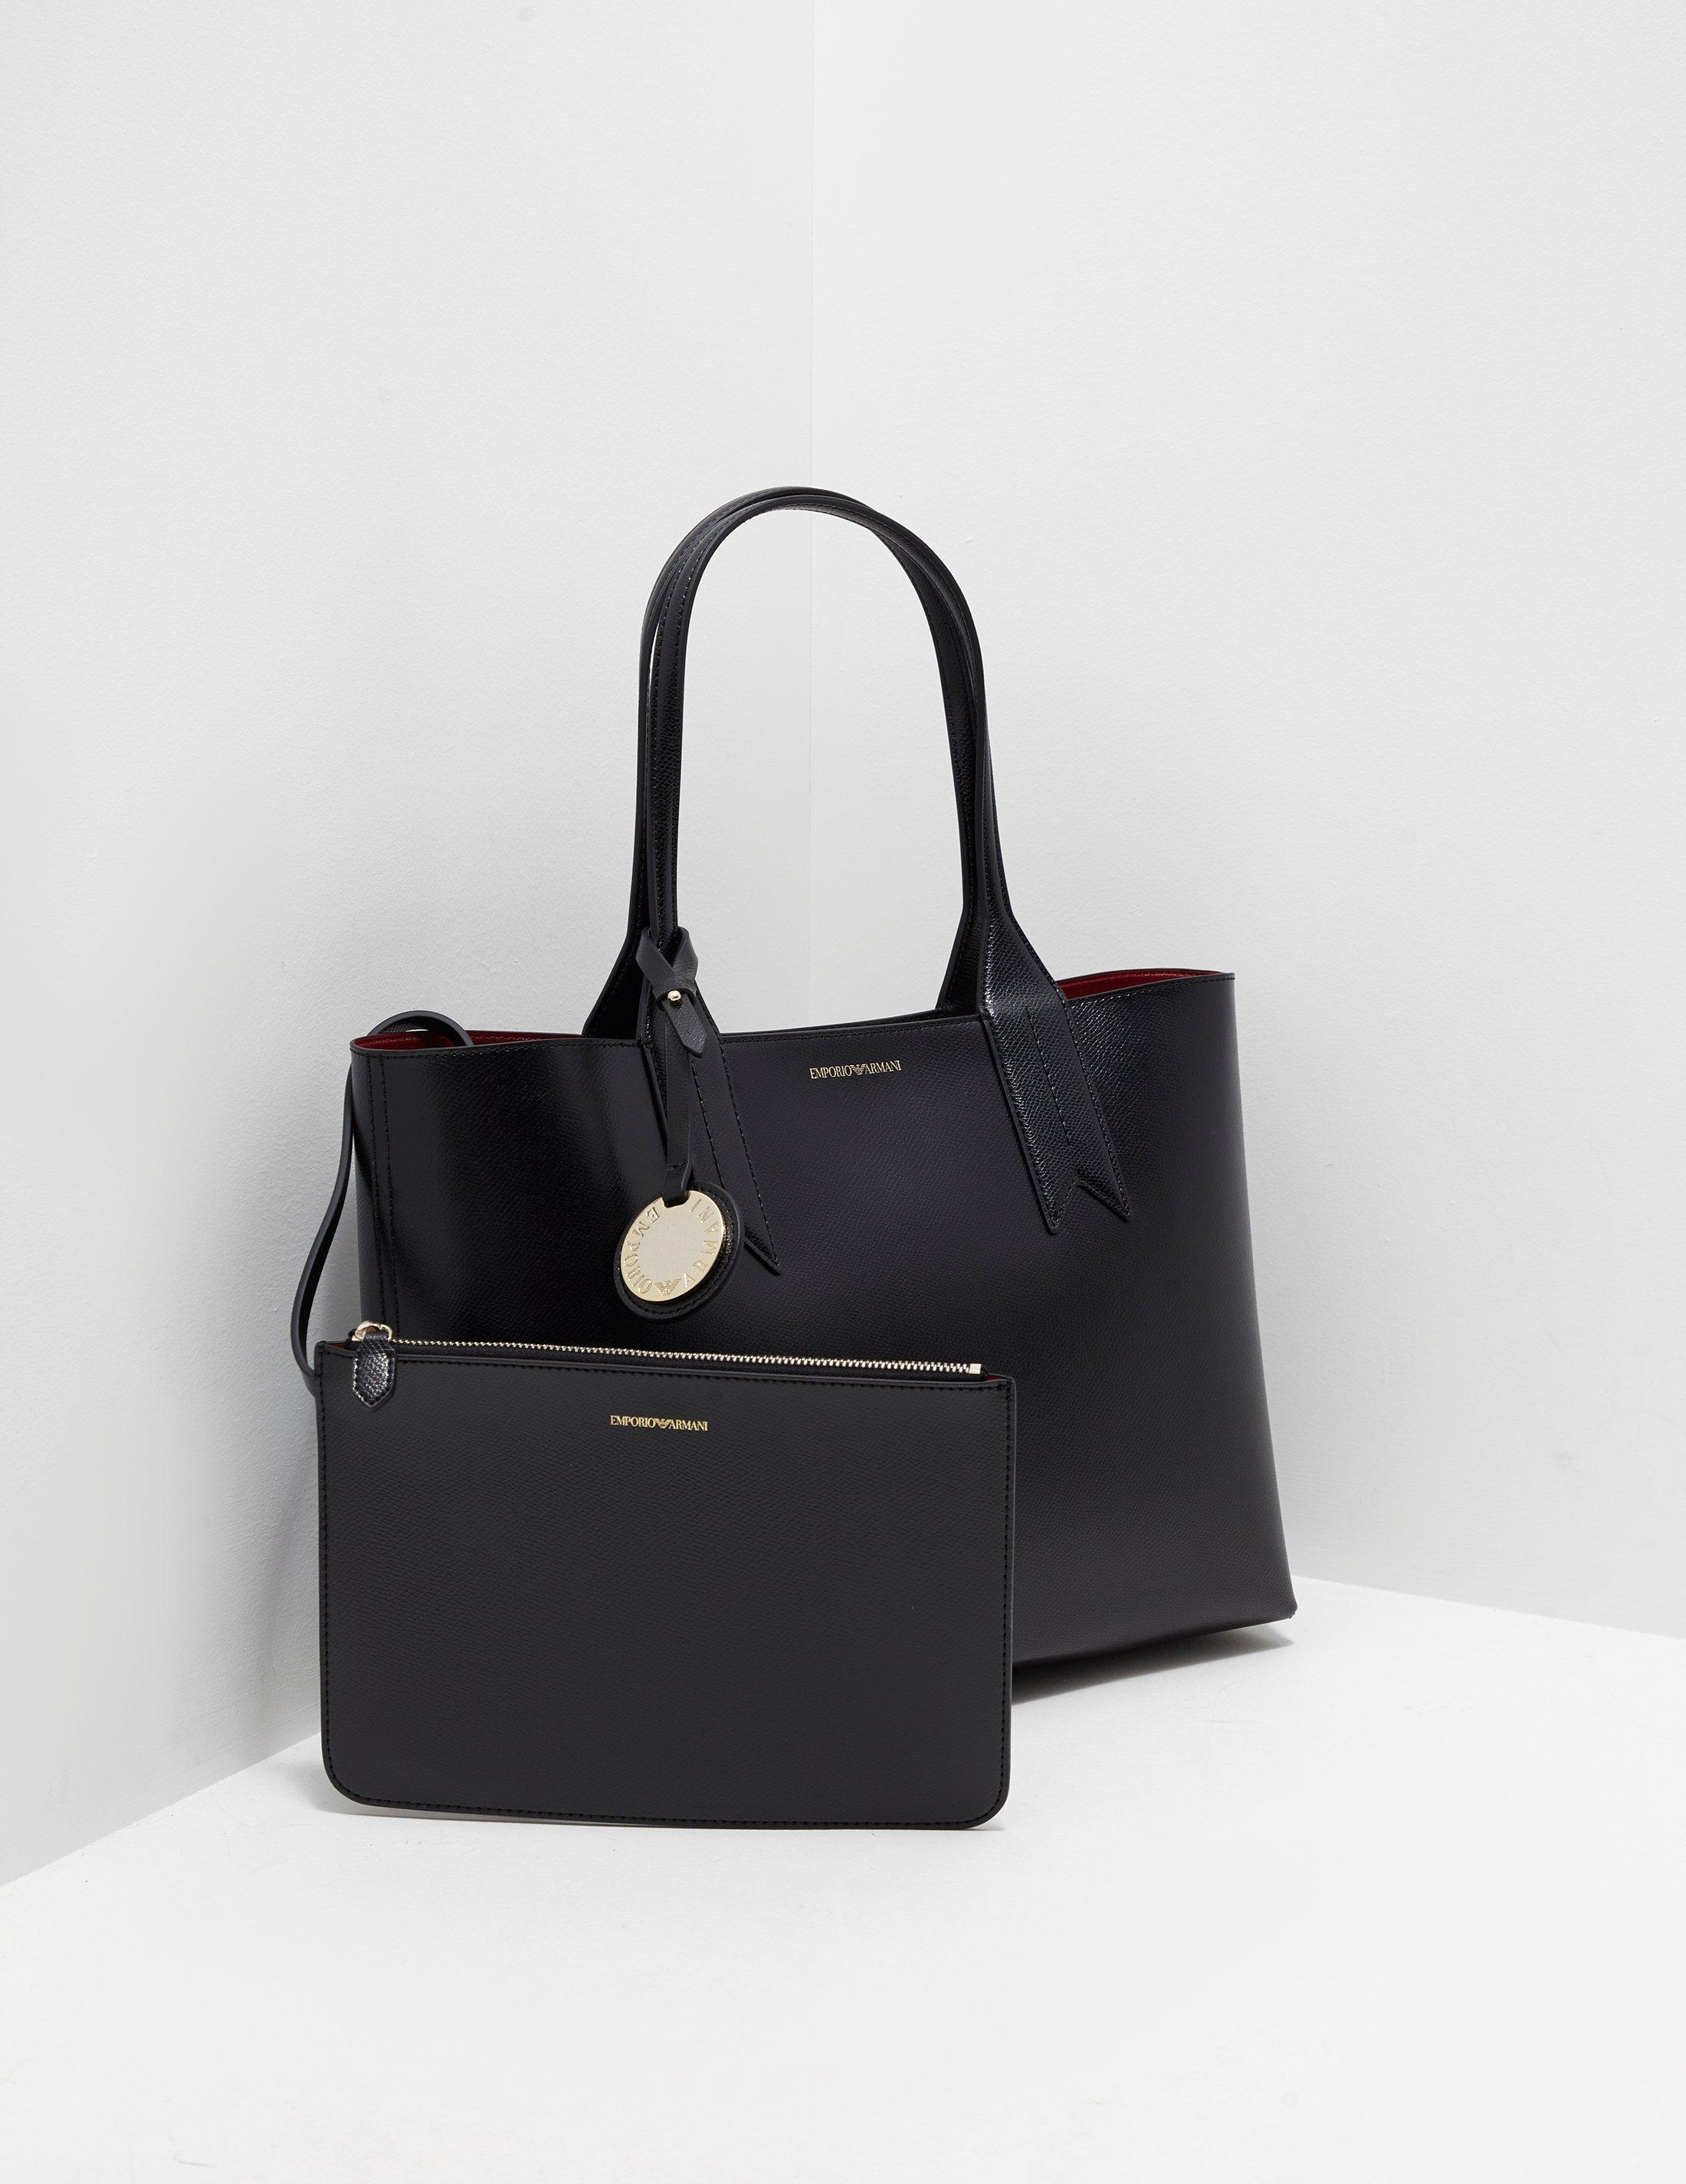 Emporio Armani Borsa Large Shopper Bag Black in Black - Lyst f361c50dc9c64